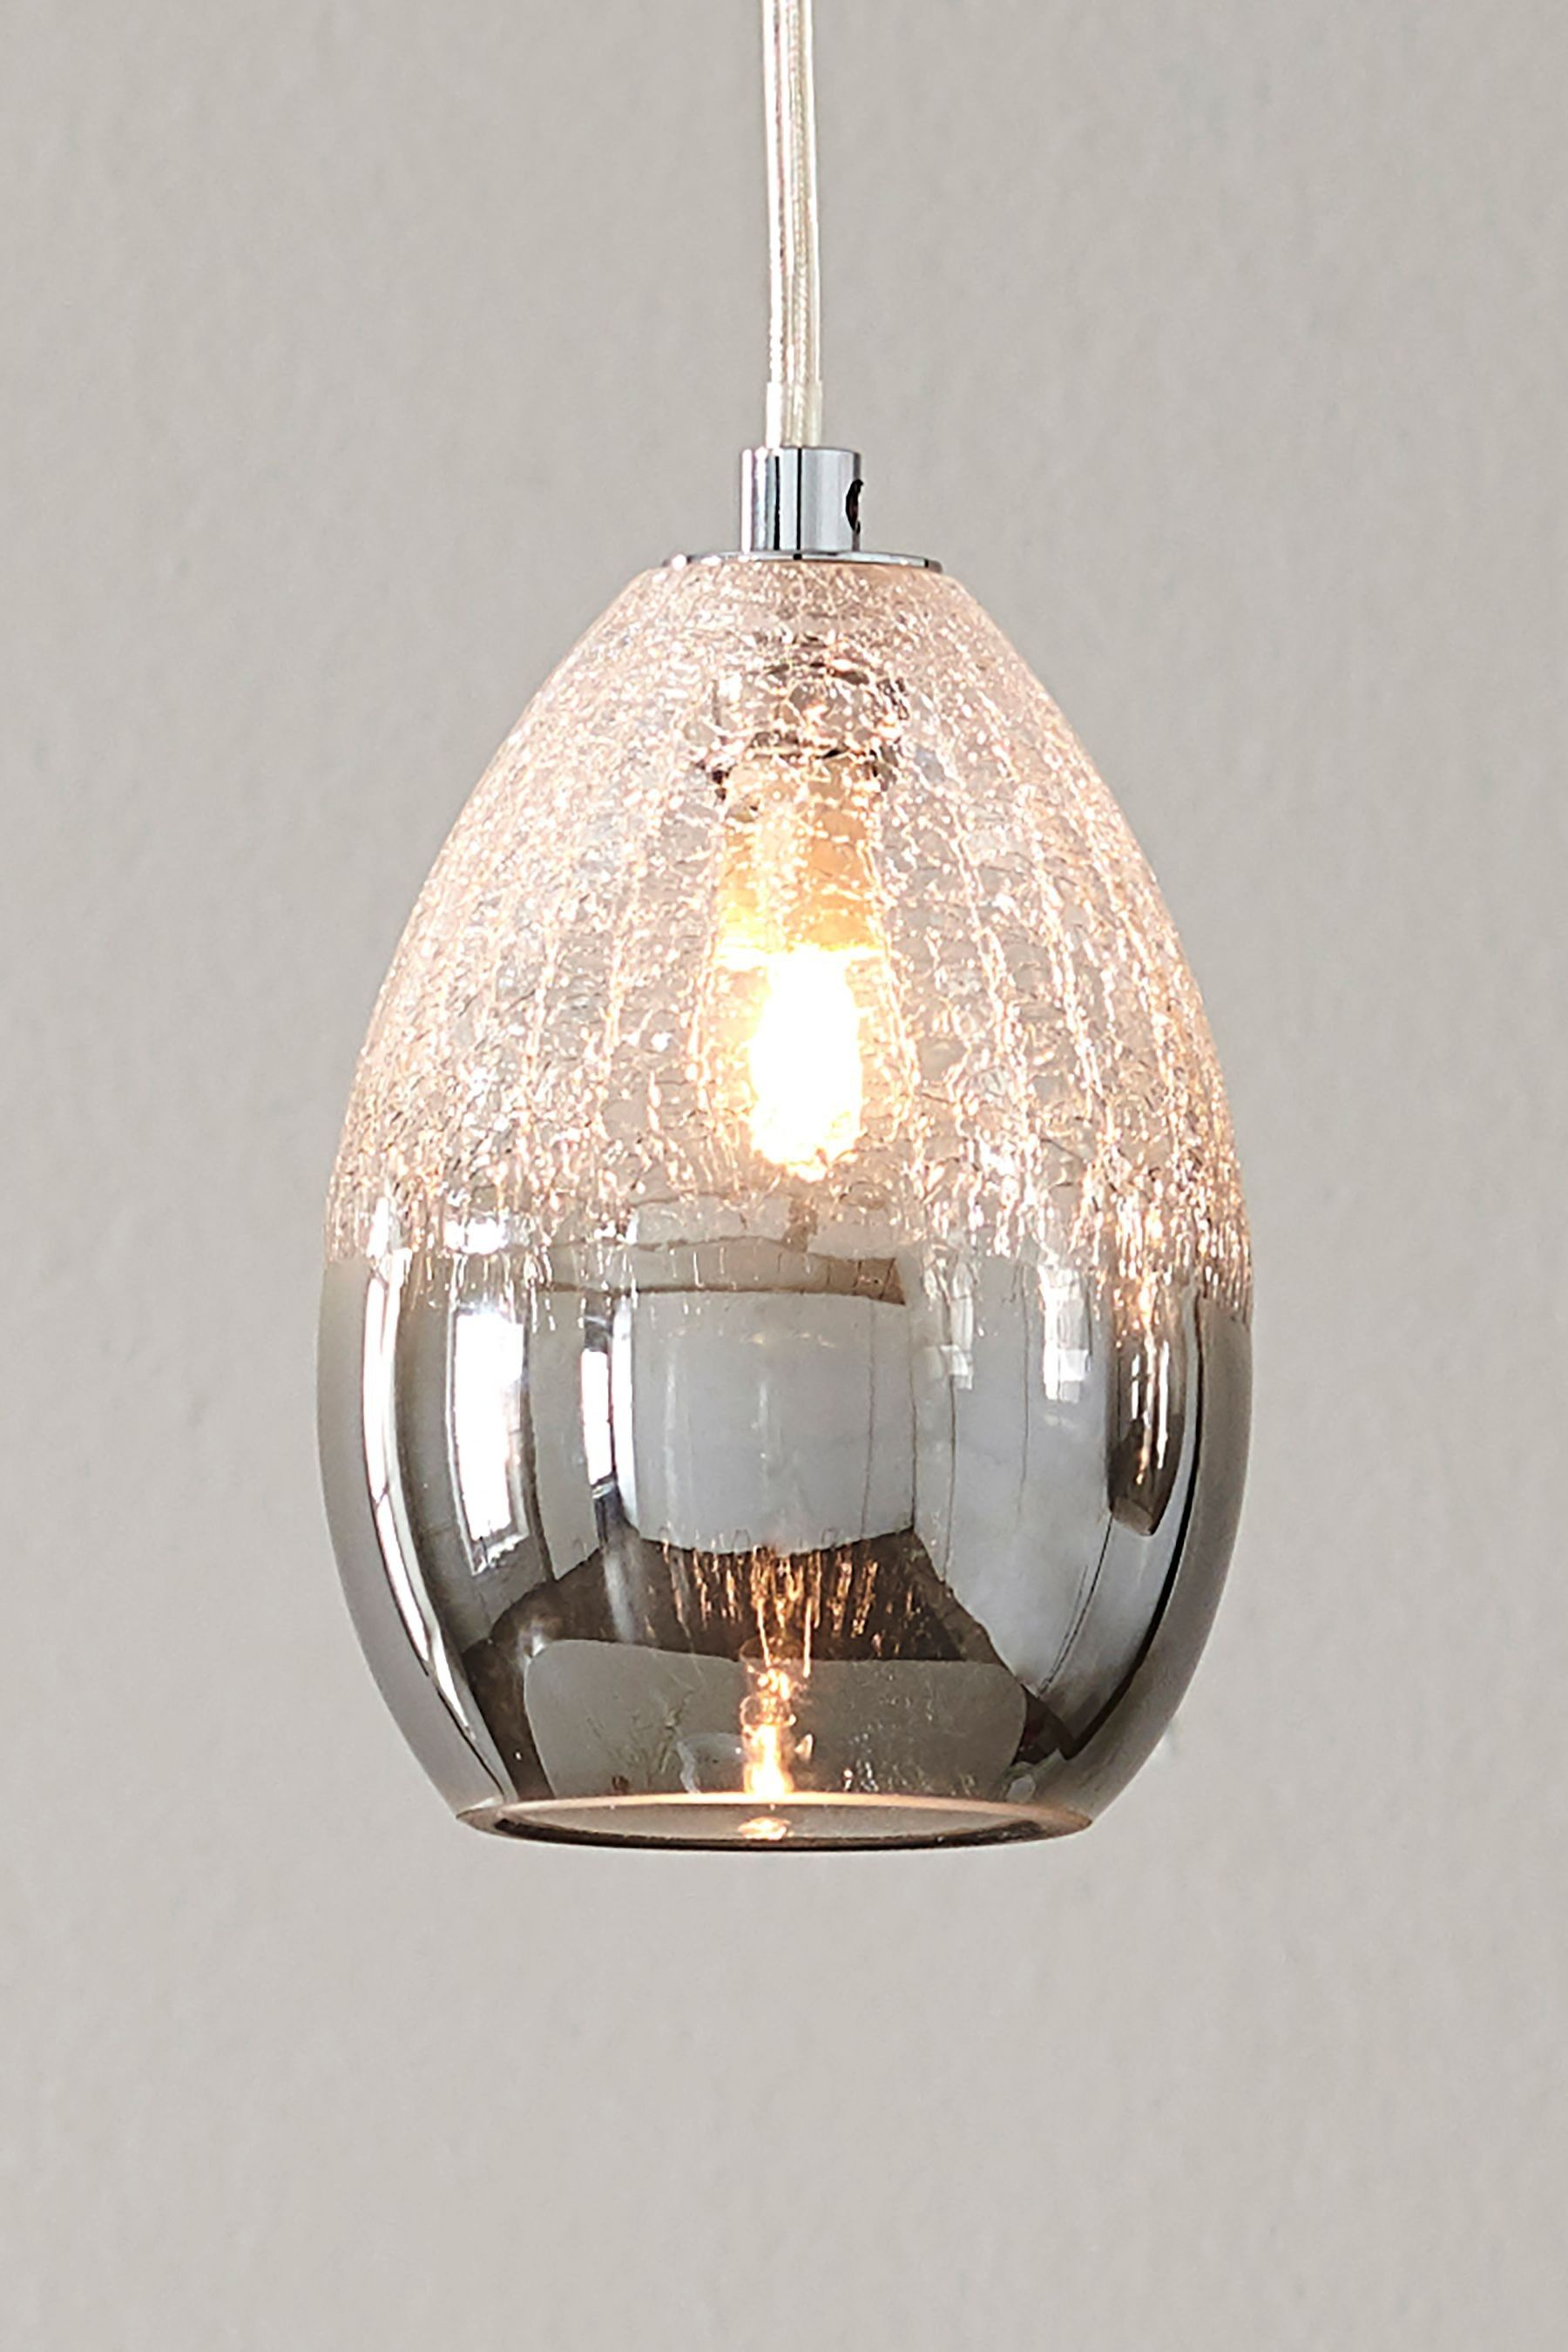 Ceiling Lamp Shades | Dunelm